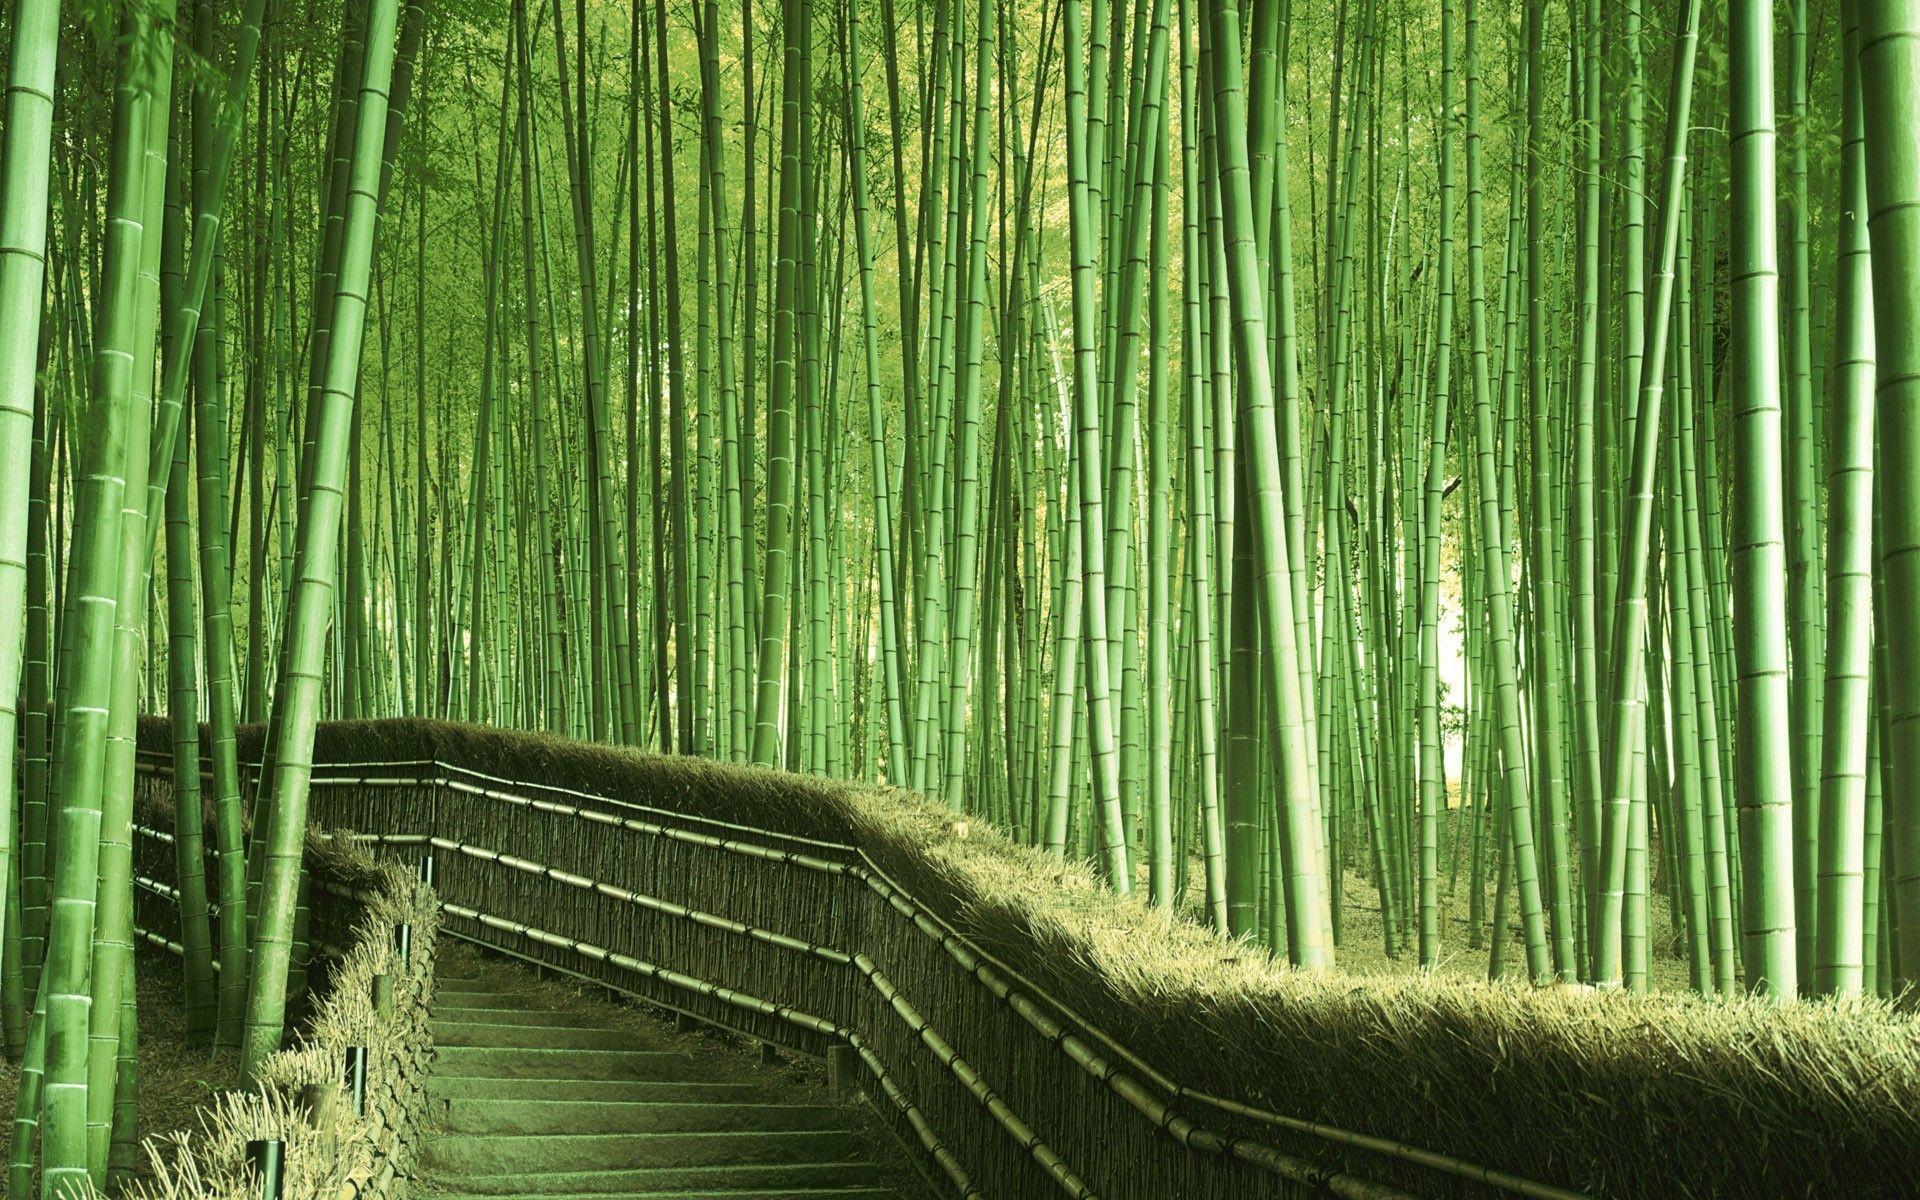 Potted Bamboo Plant Wallpaper Bamboo Wallpaper Bamboo Tree Bamboo Garden